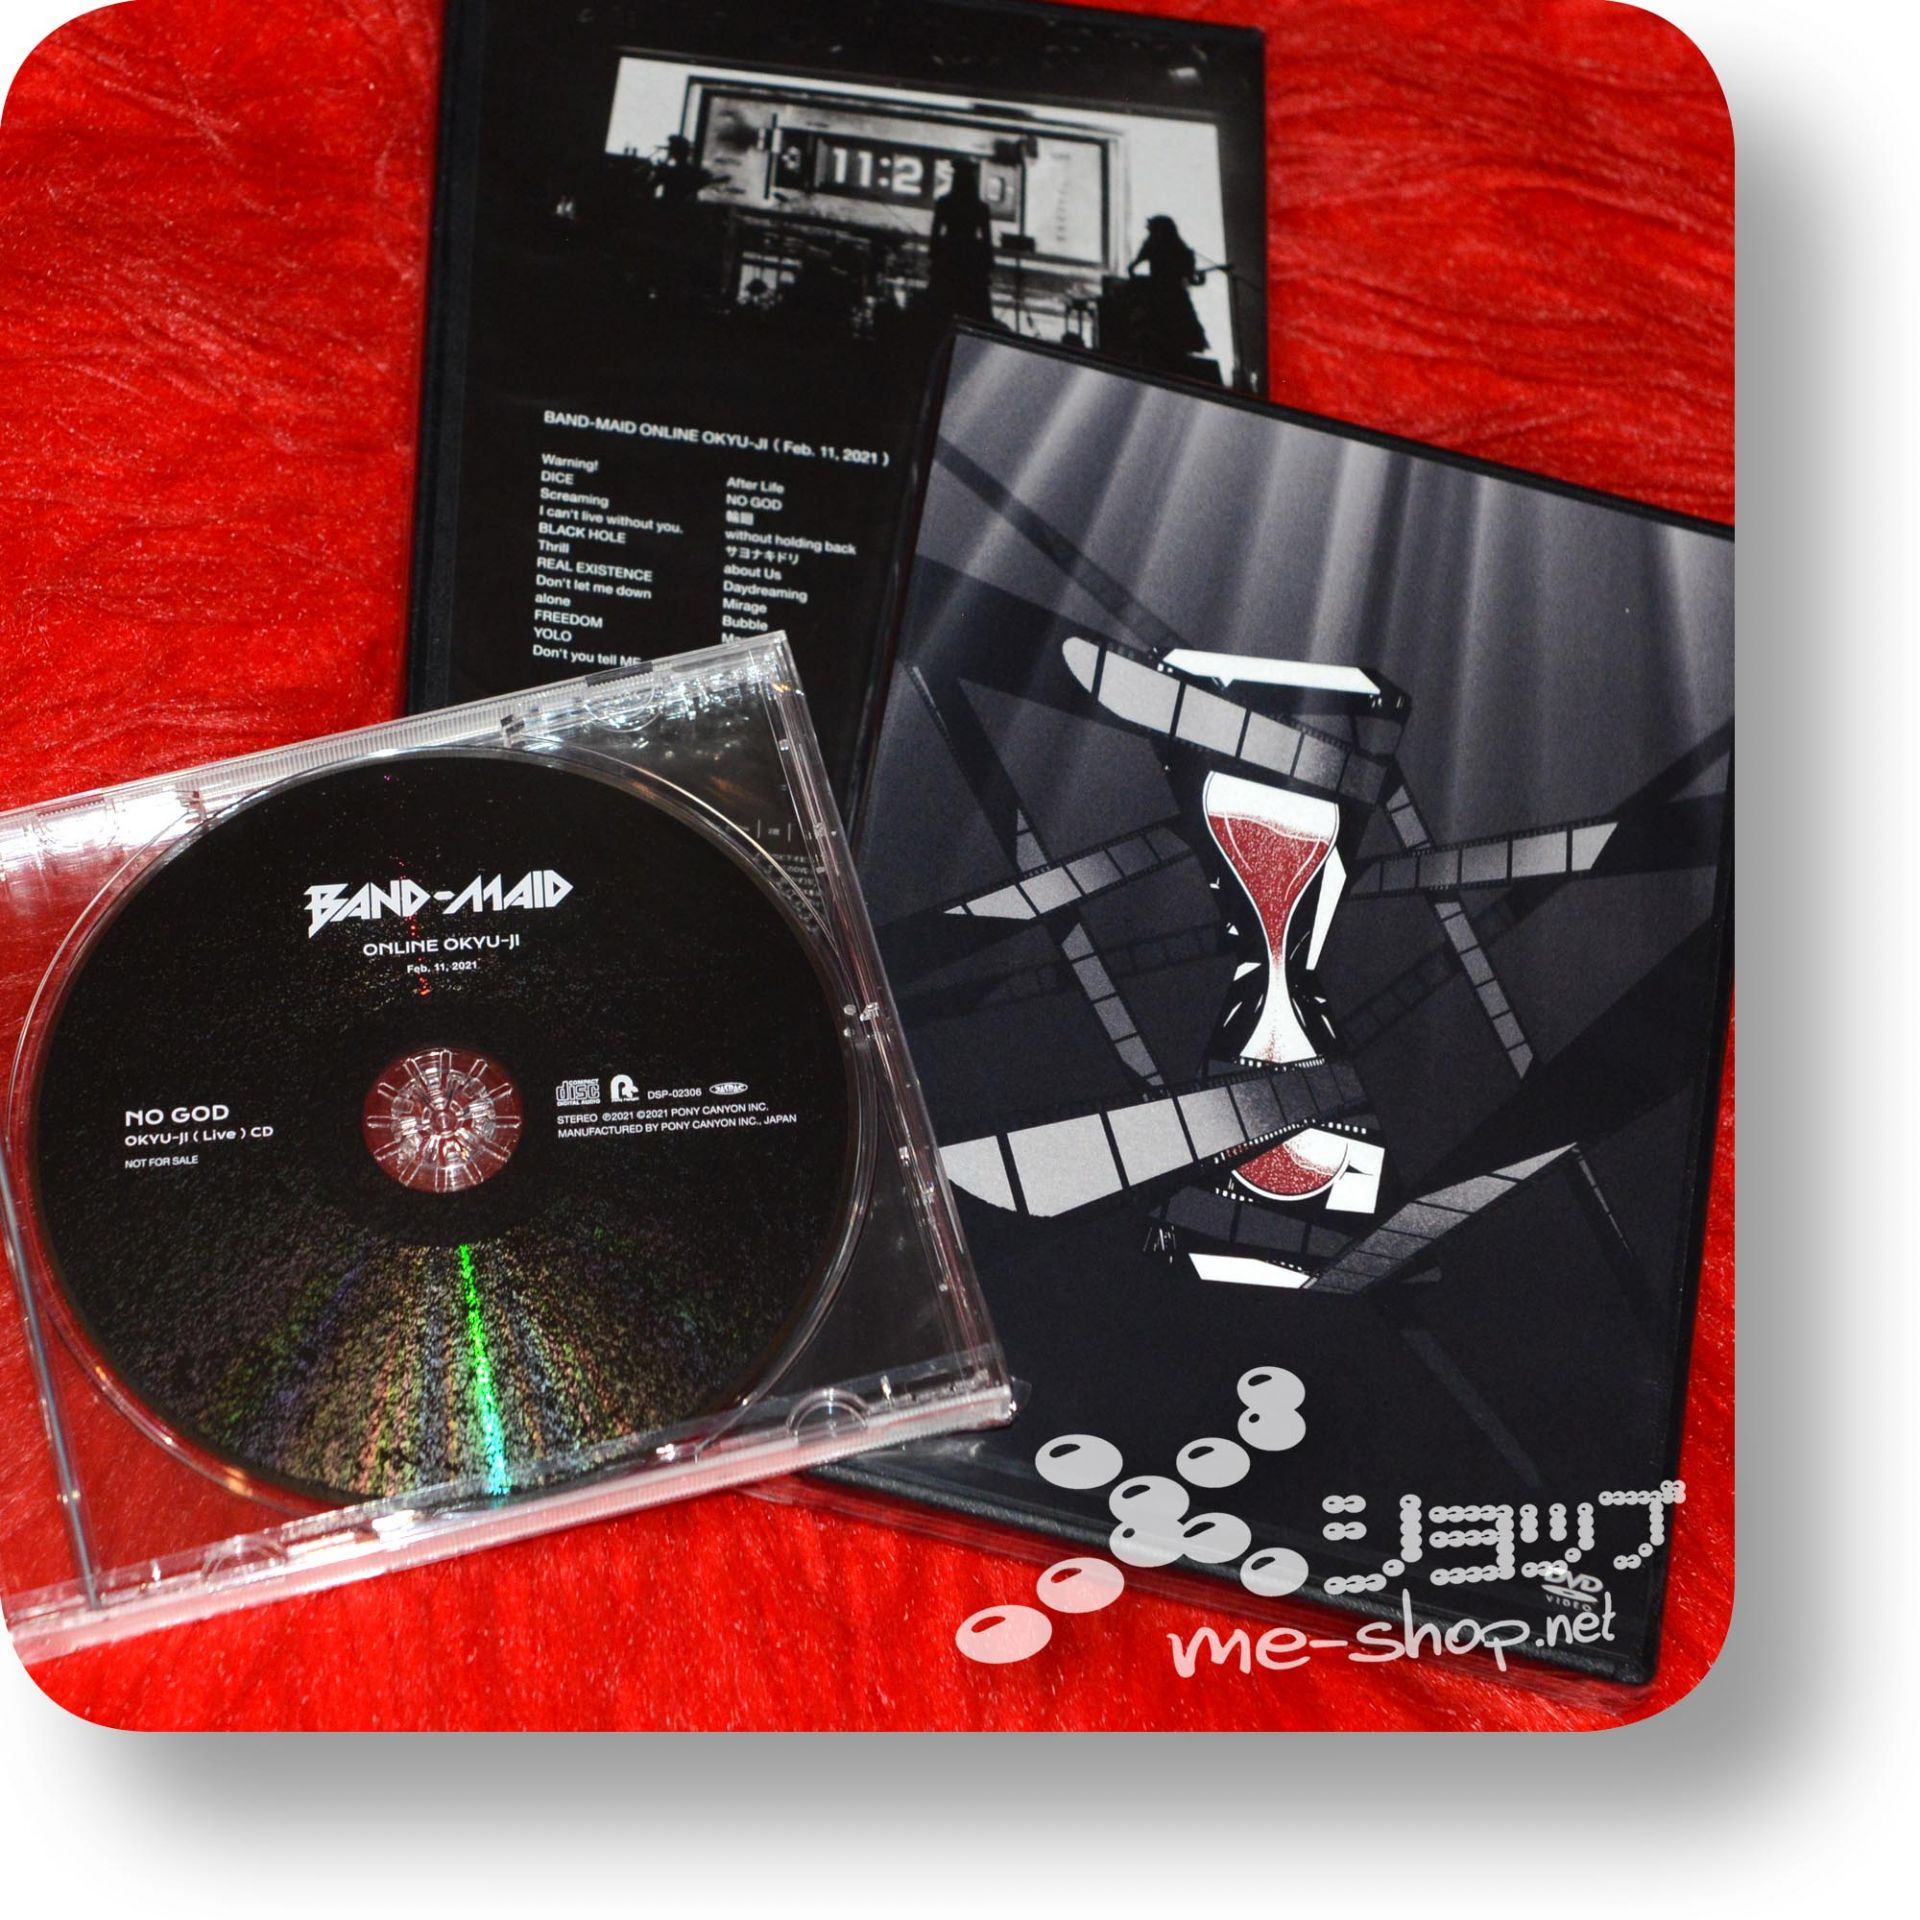 band-maid online okyu-ji dvd+bonus